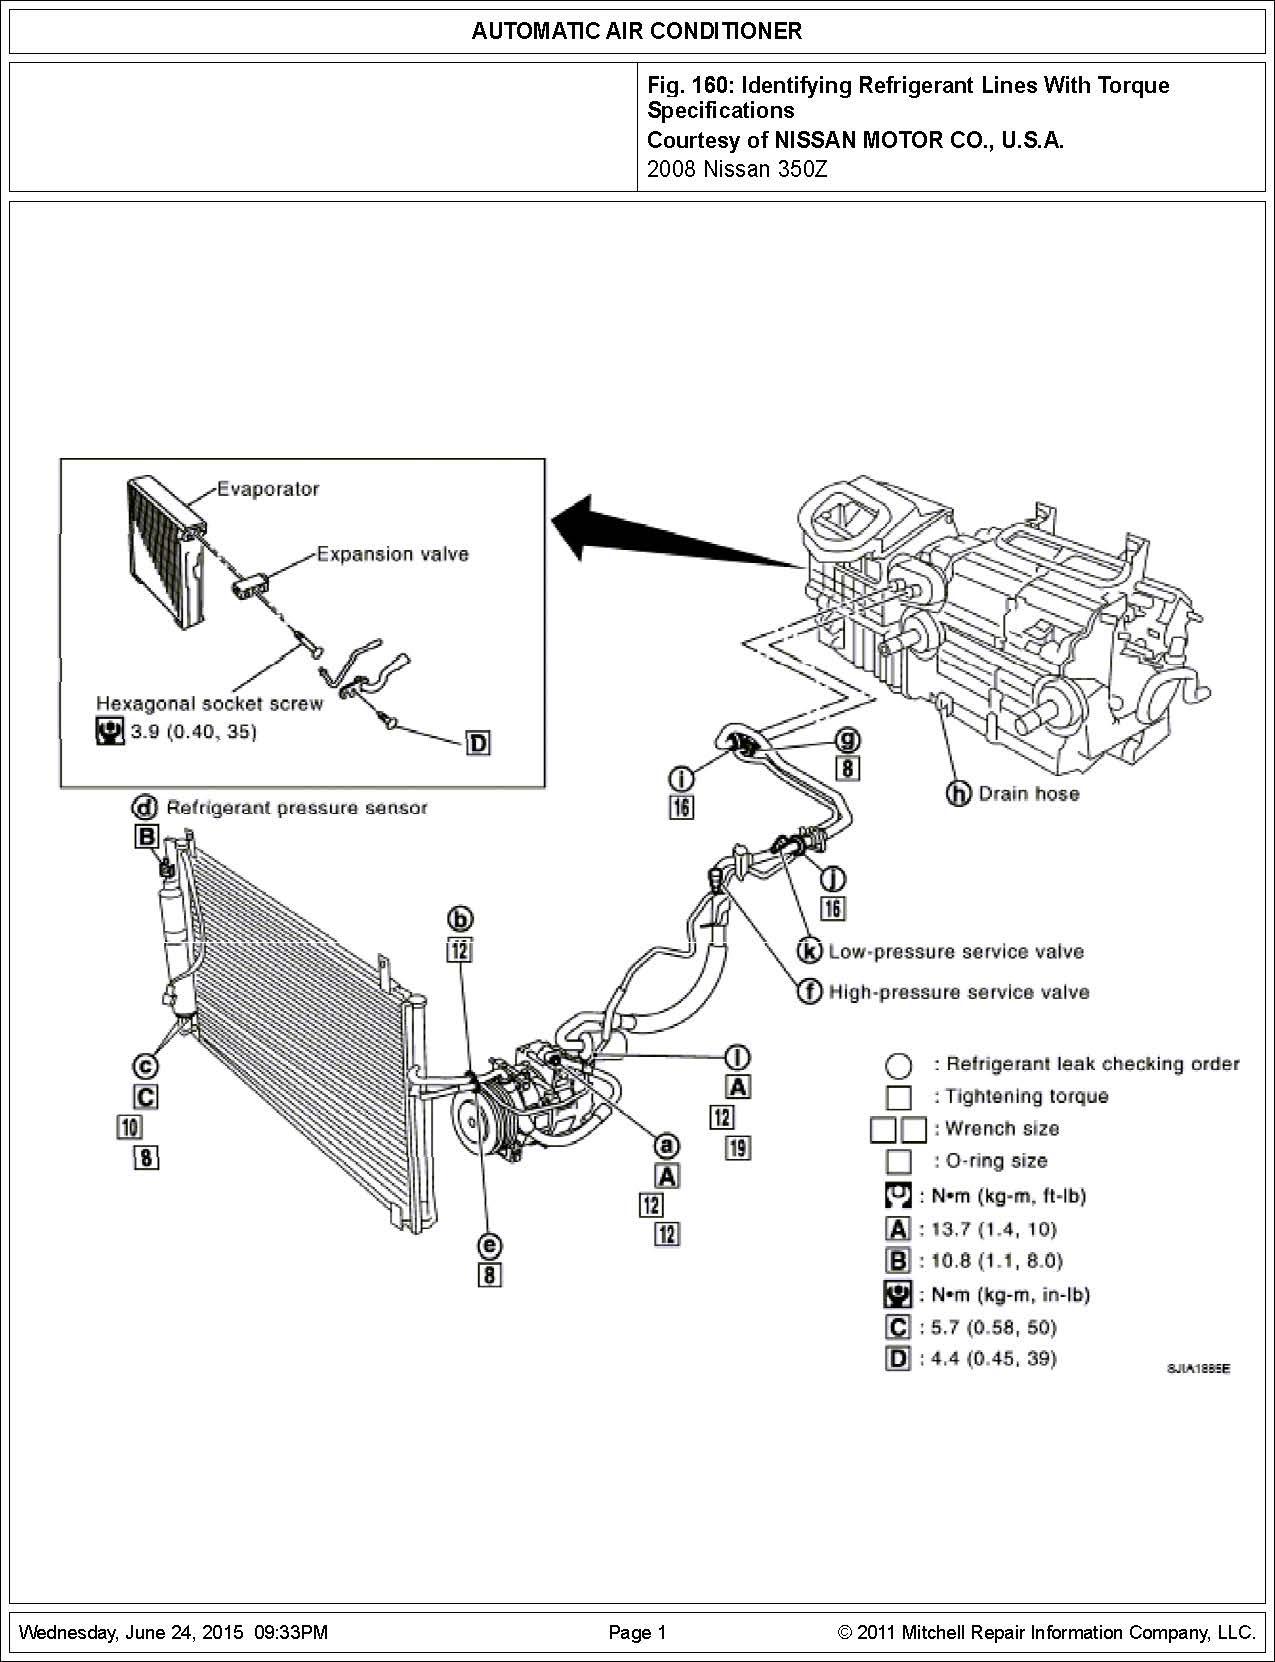 2006 Nissan 350z Headlight Wiring Diagram 1990 Miata Stereo Wiring Diagram Begeboy Wiring Diagram Source